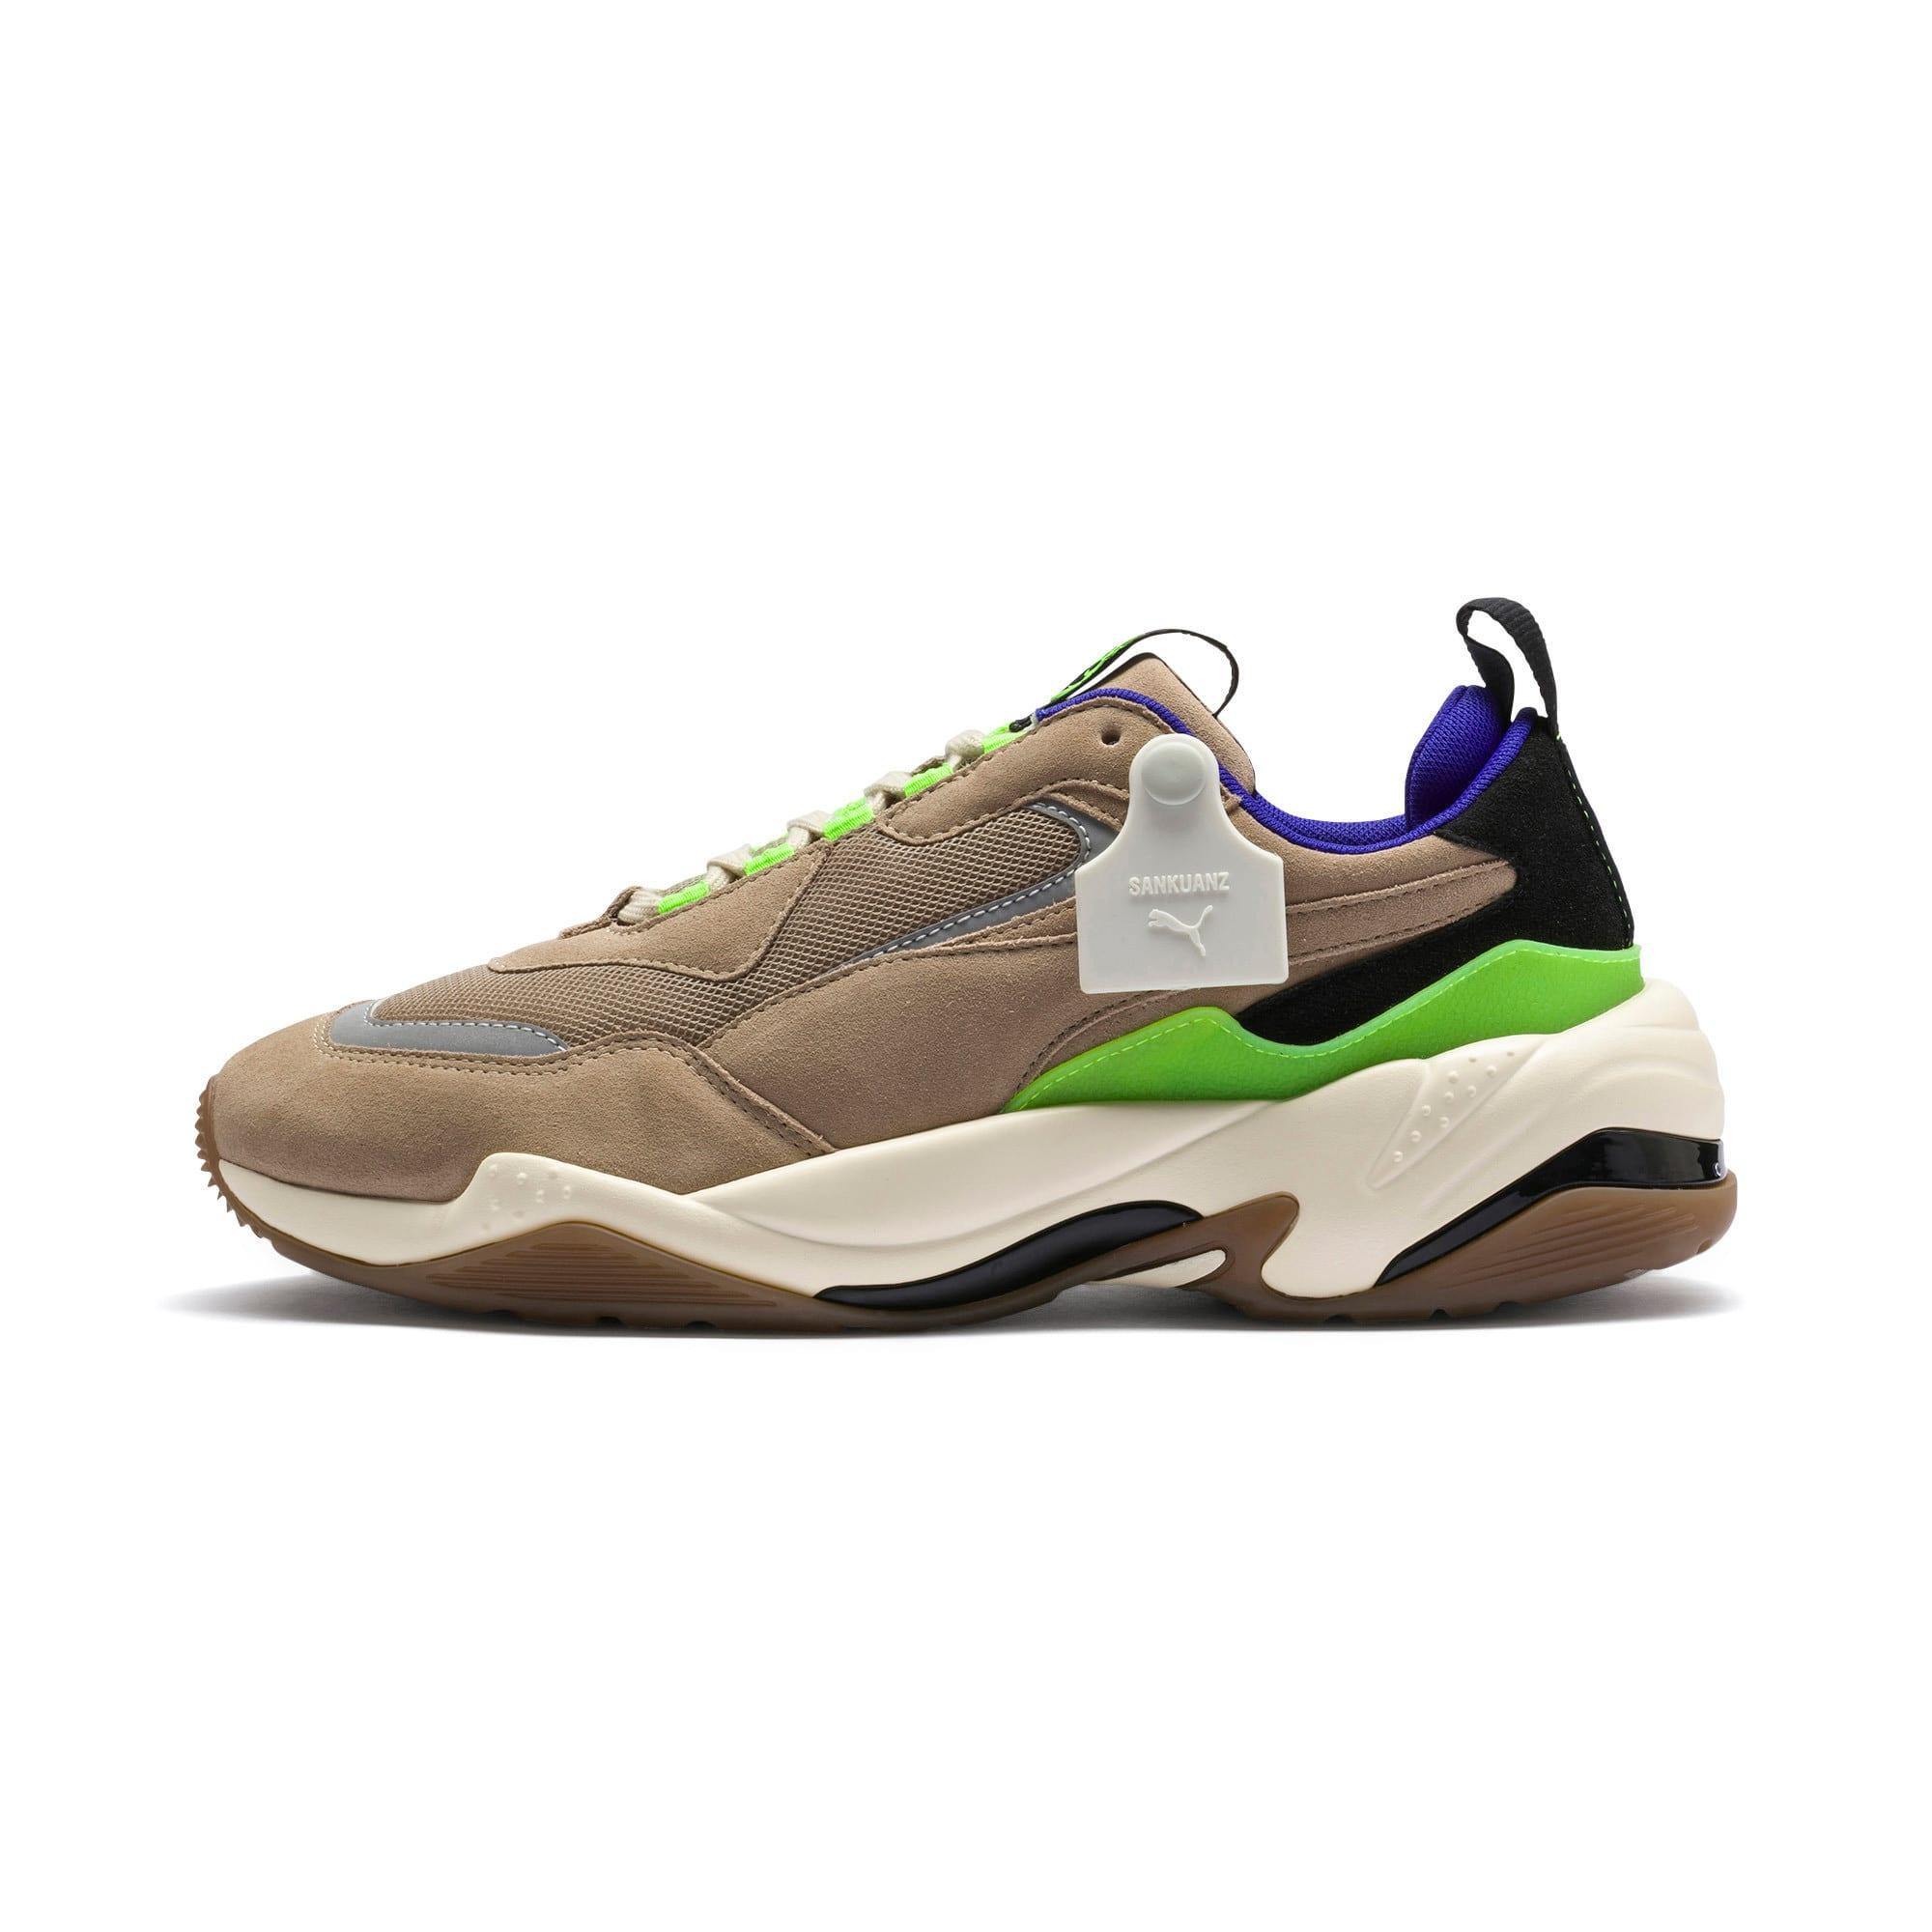 Thunder SANKUANZ Sneakers